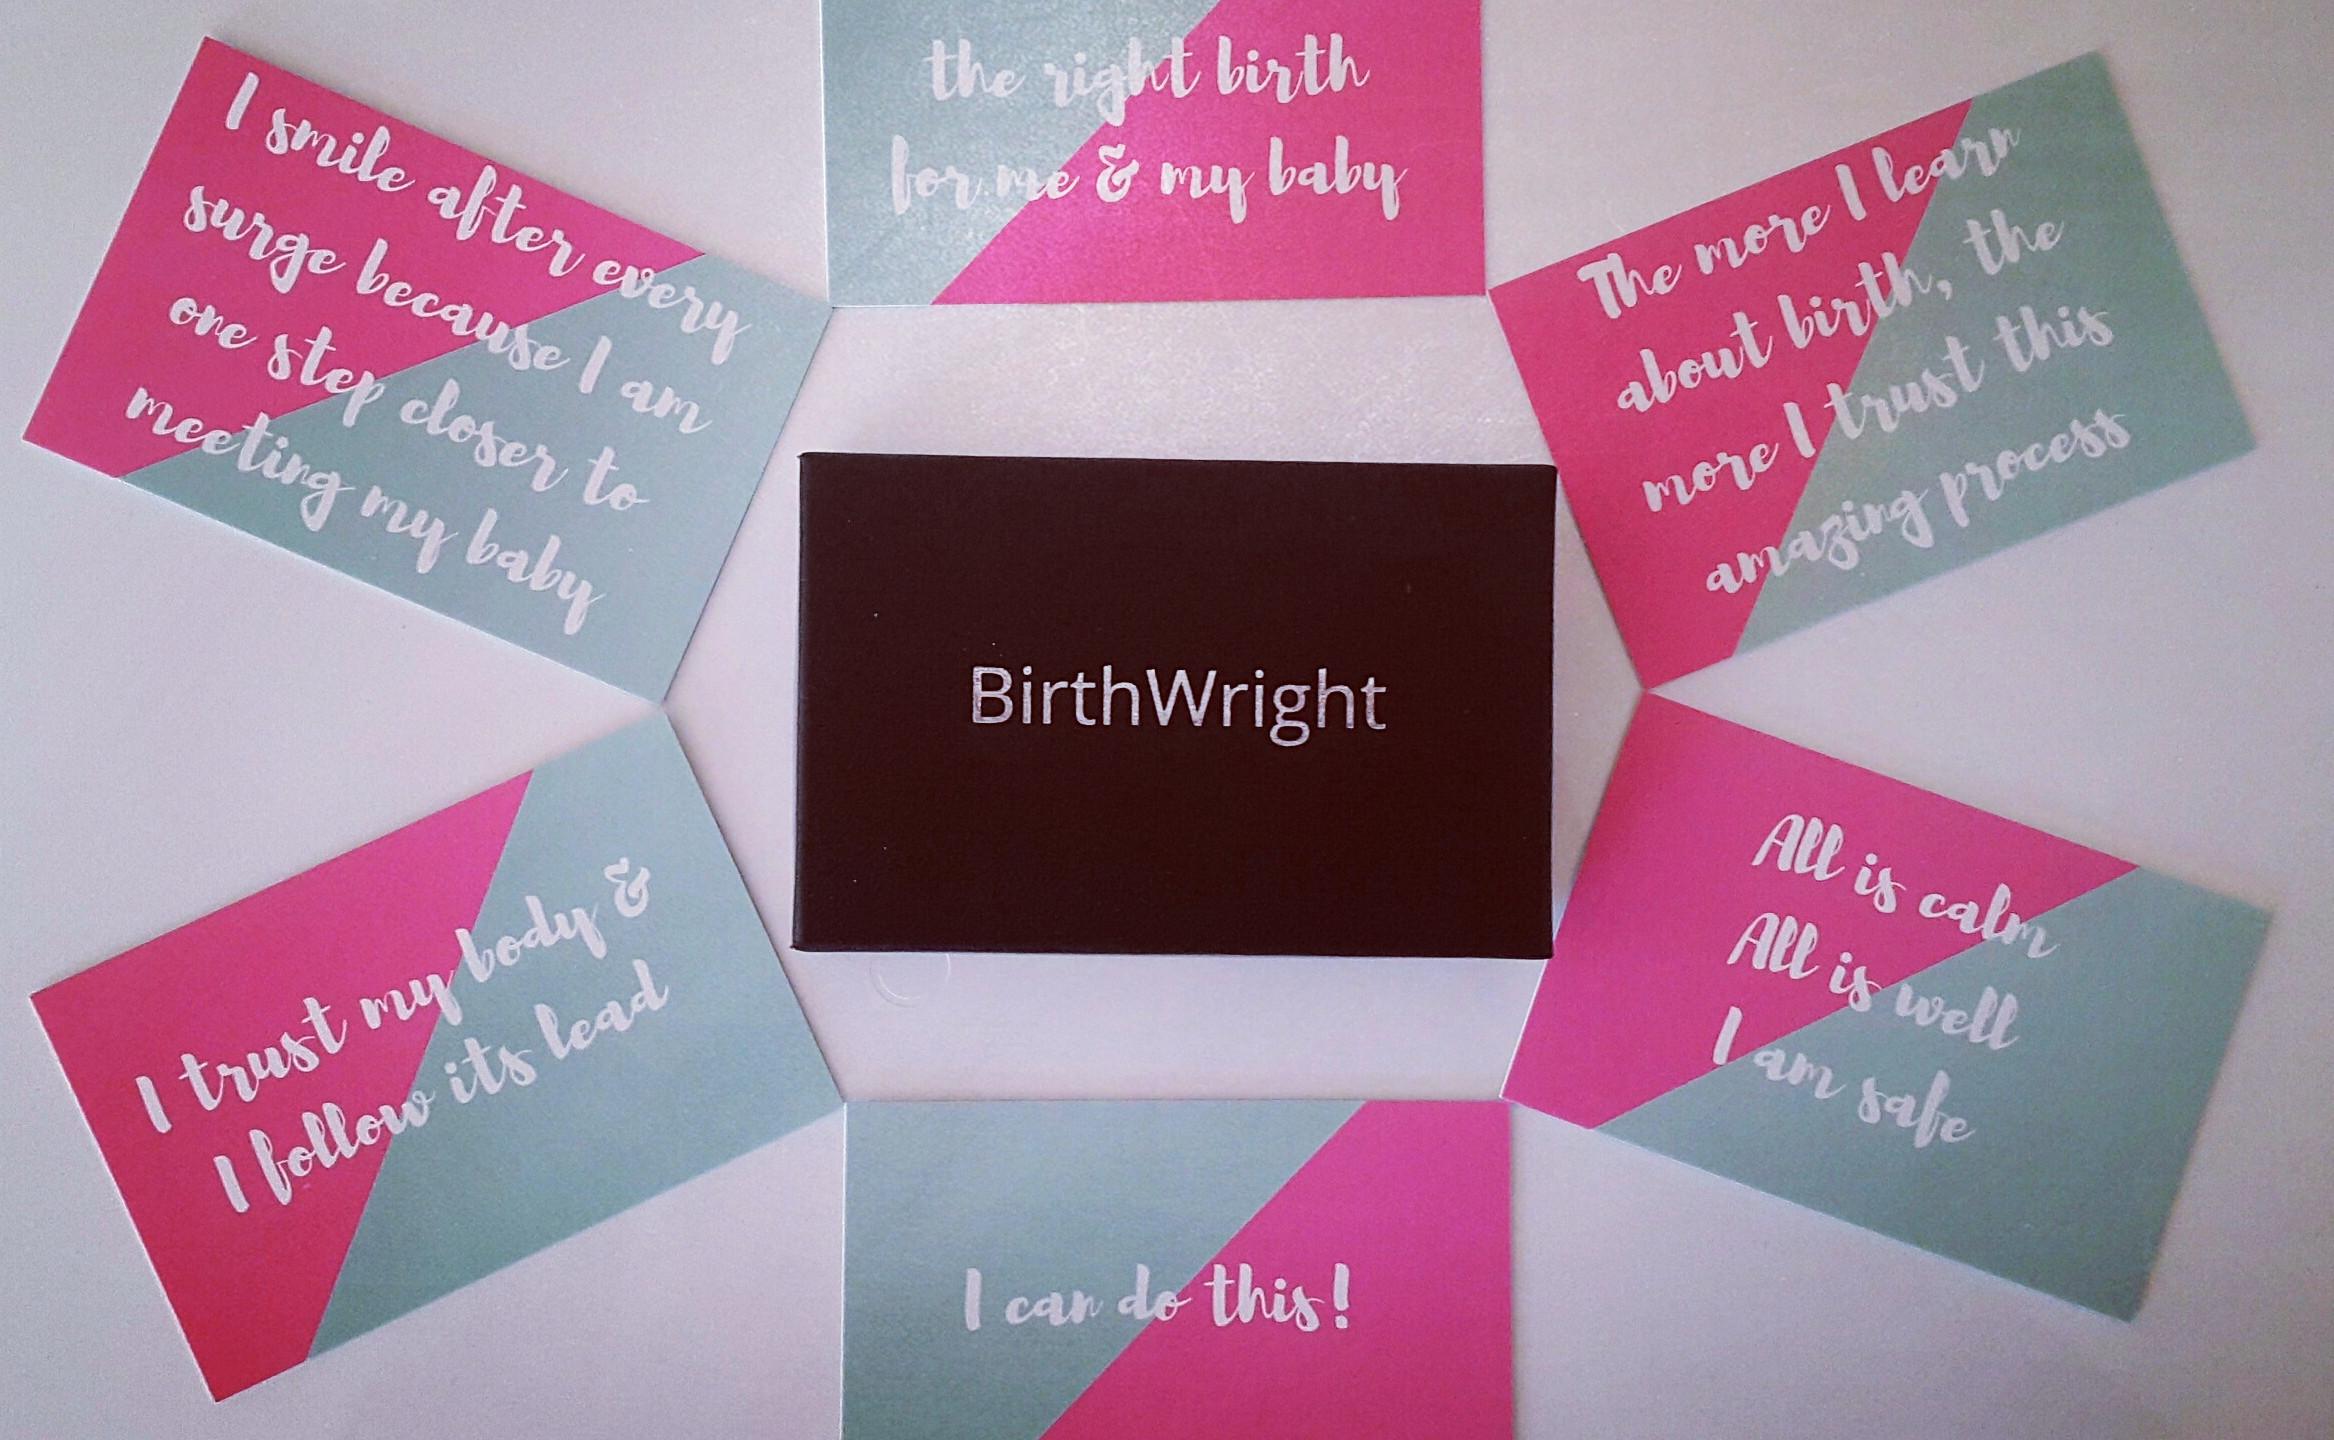 BirthWright Affirmation Cards